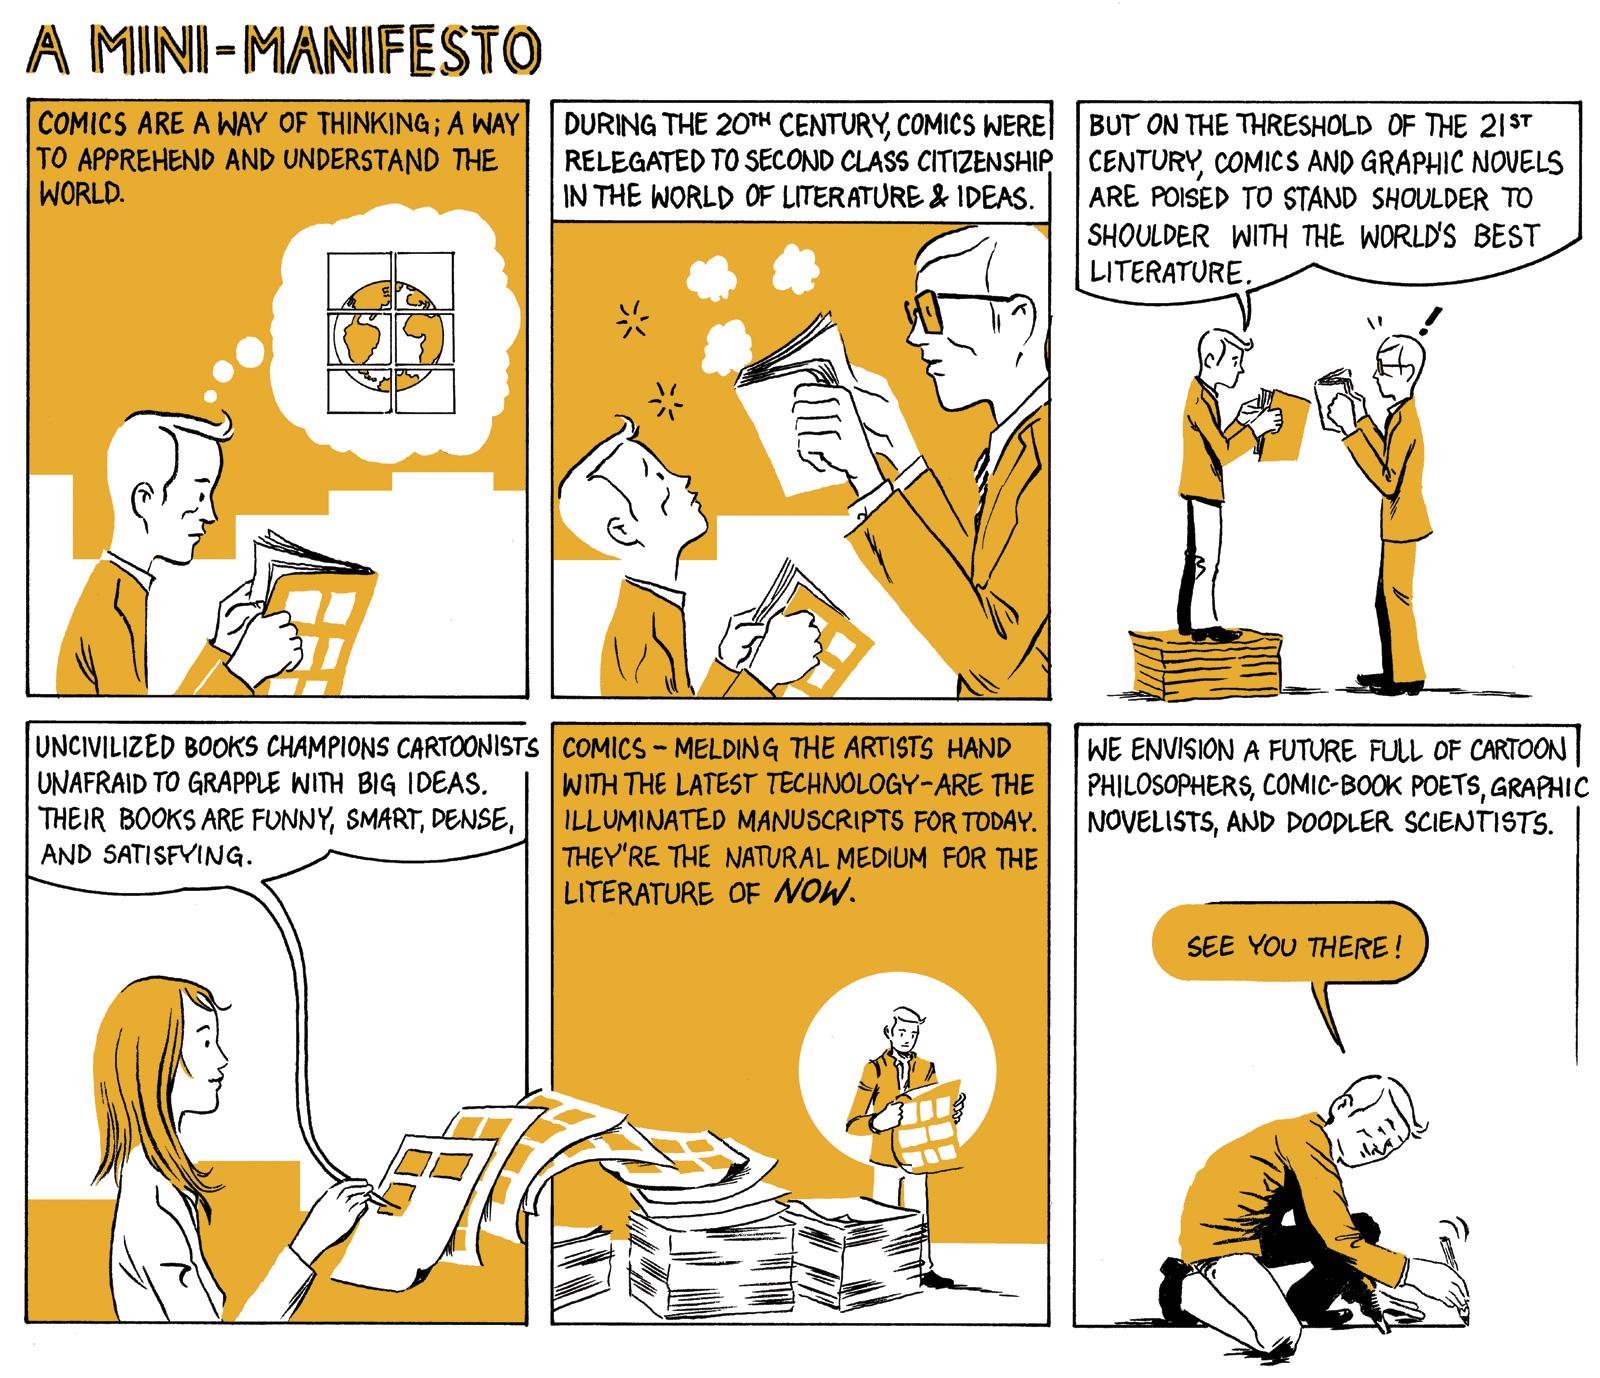 unciv-manifesto-color-1600px.jpg